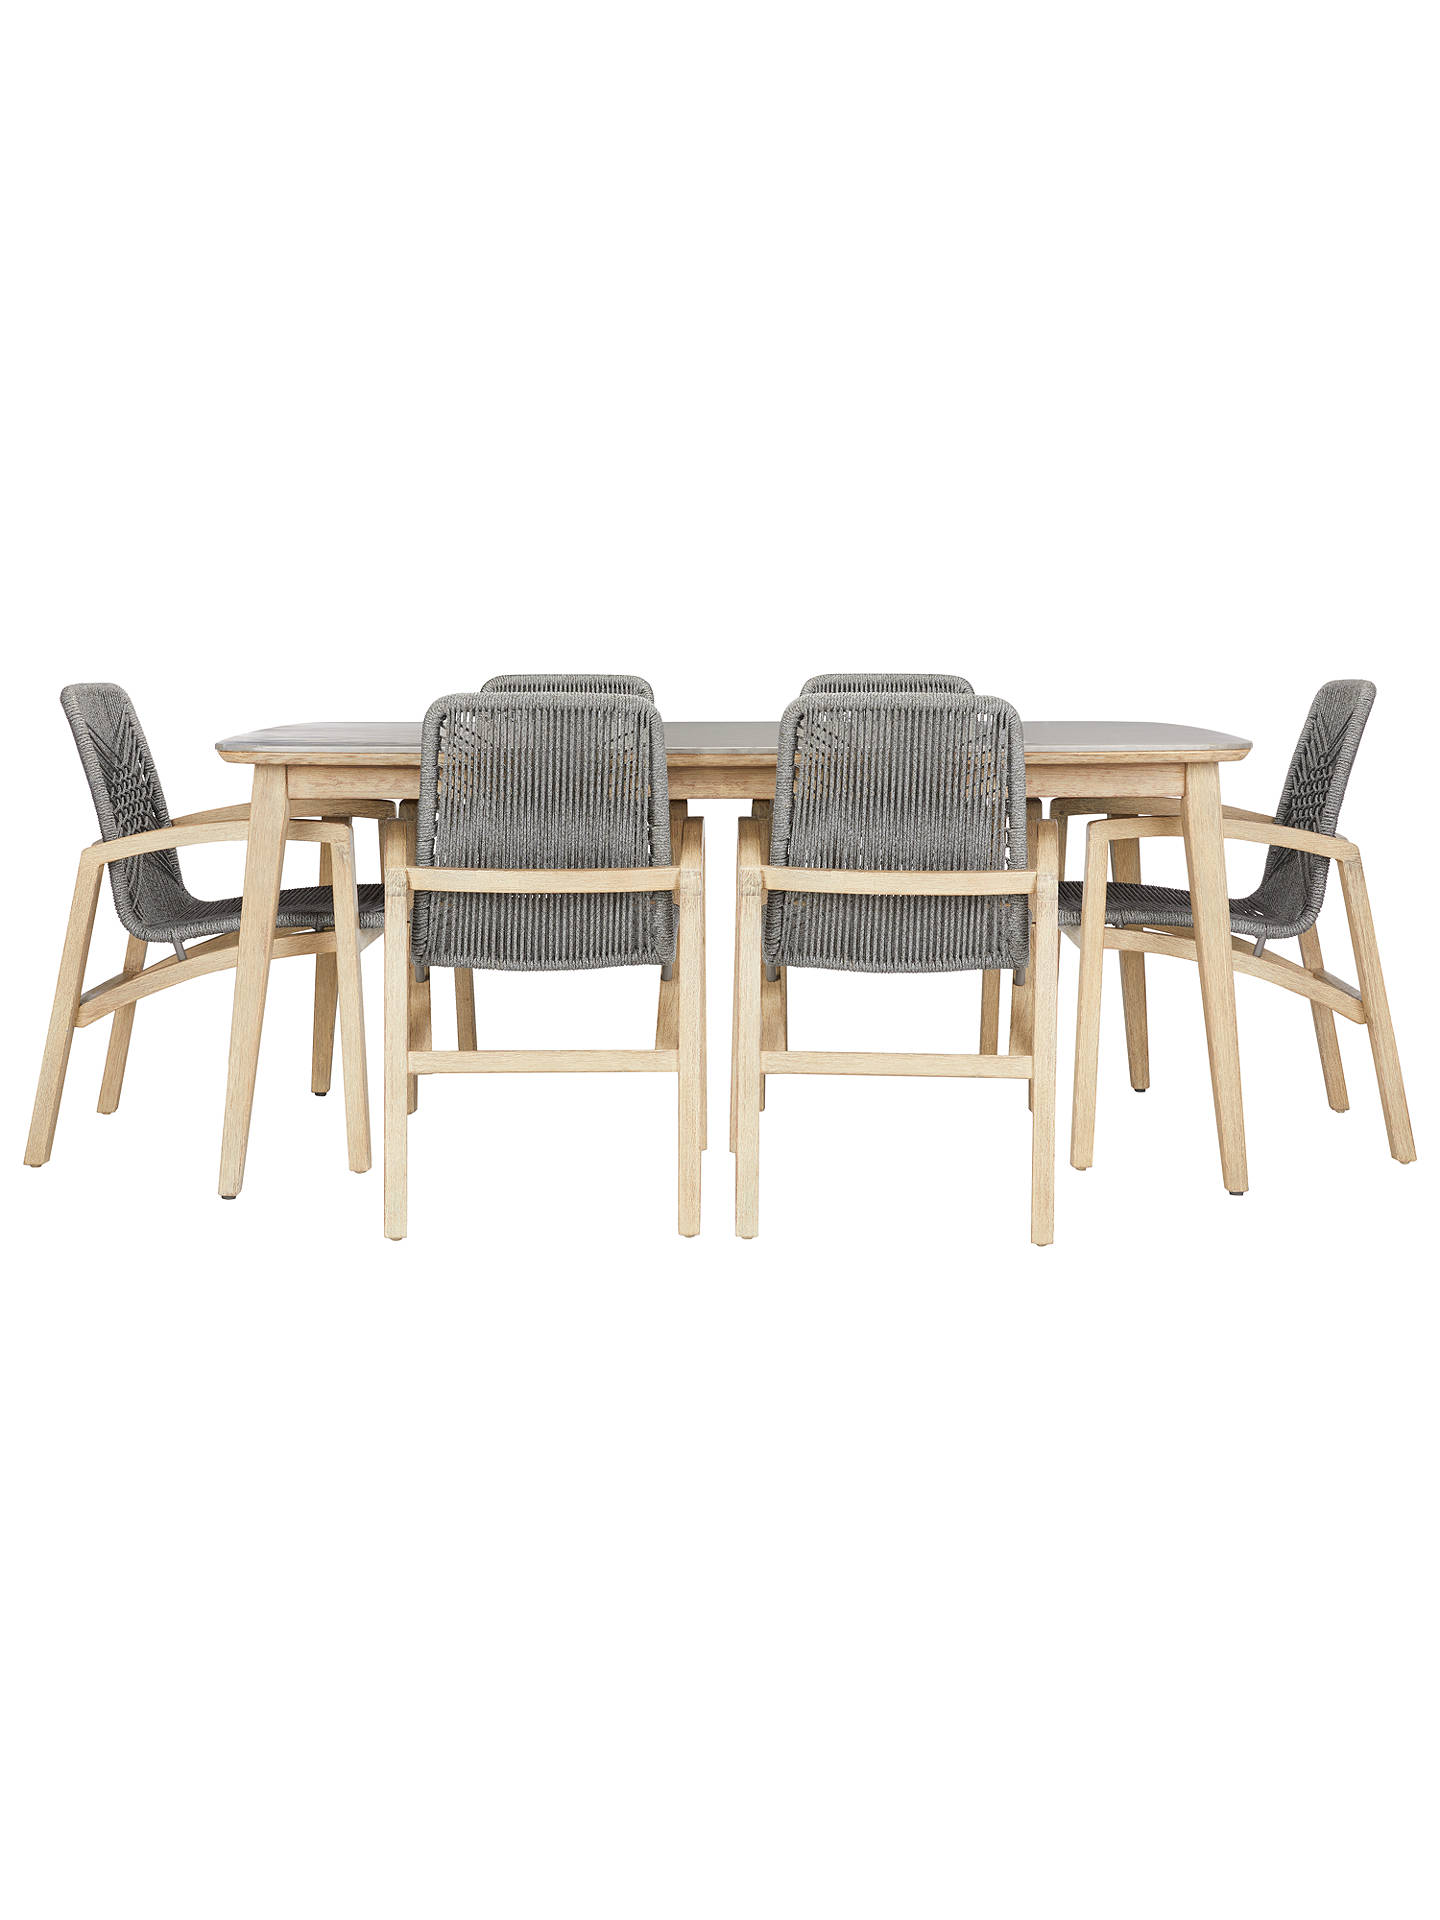 John Lewis Leia 6 Seater Rectangular Garden Table and ...